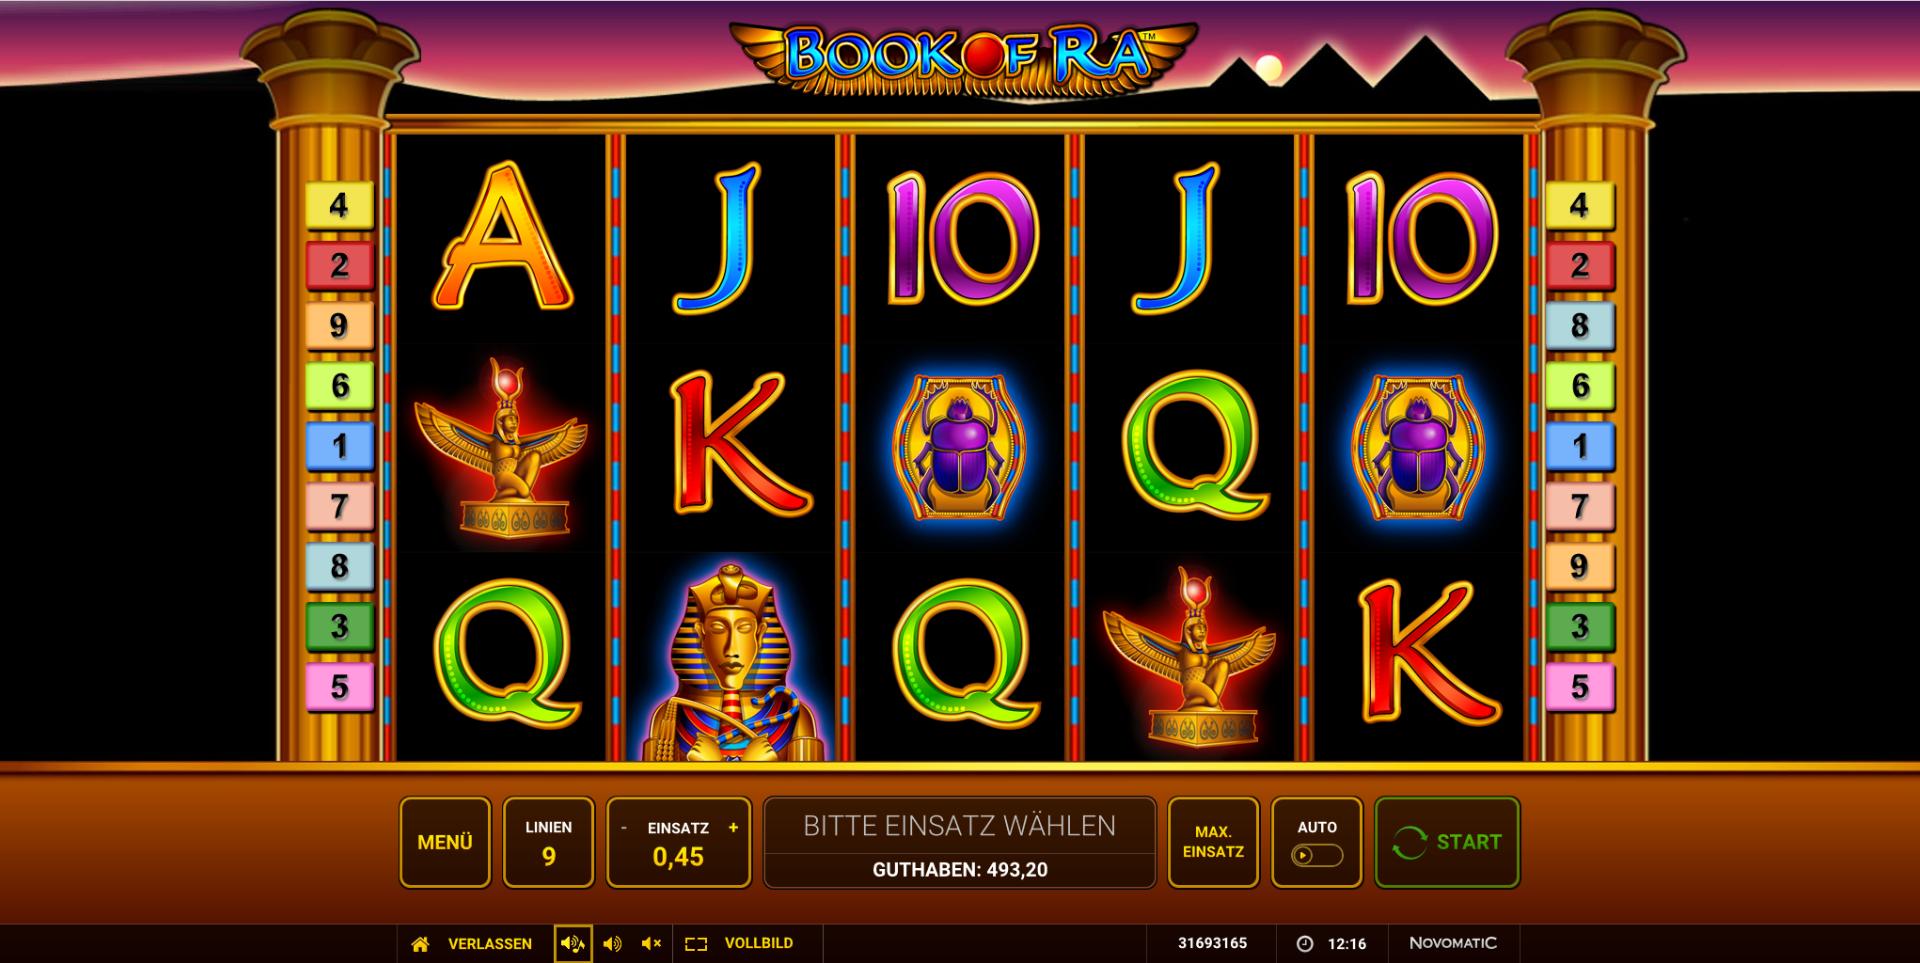 Spiele Casino Kostenlos Book Of Ra